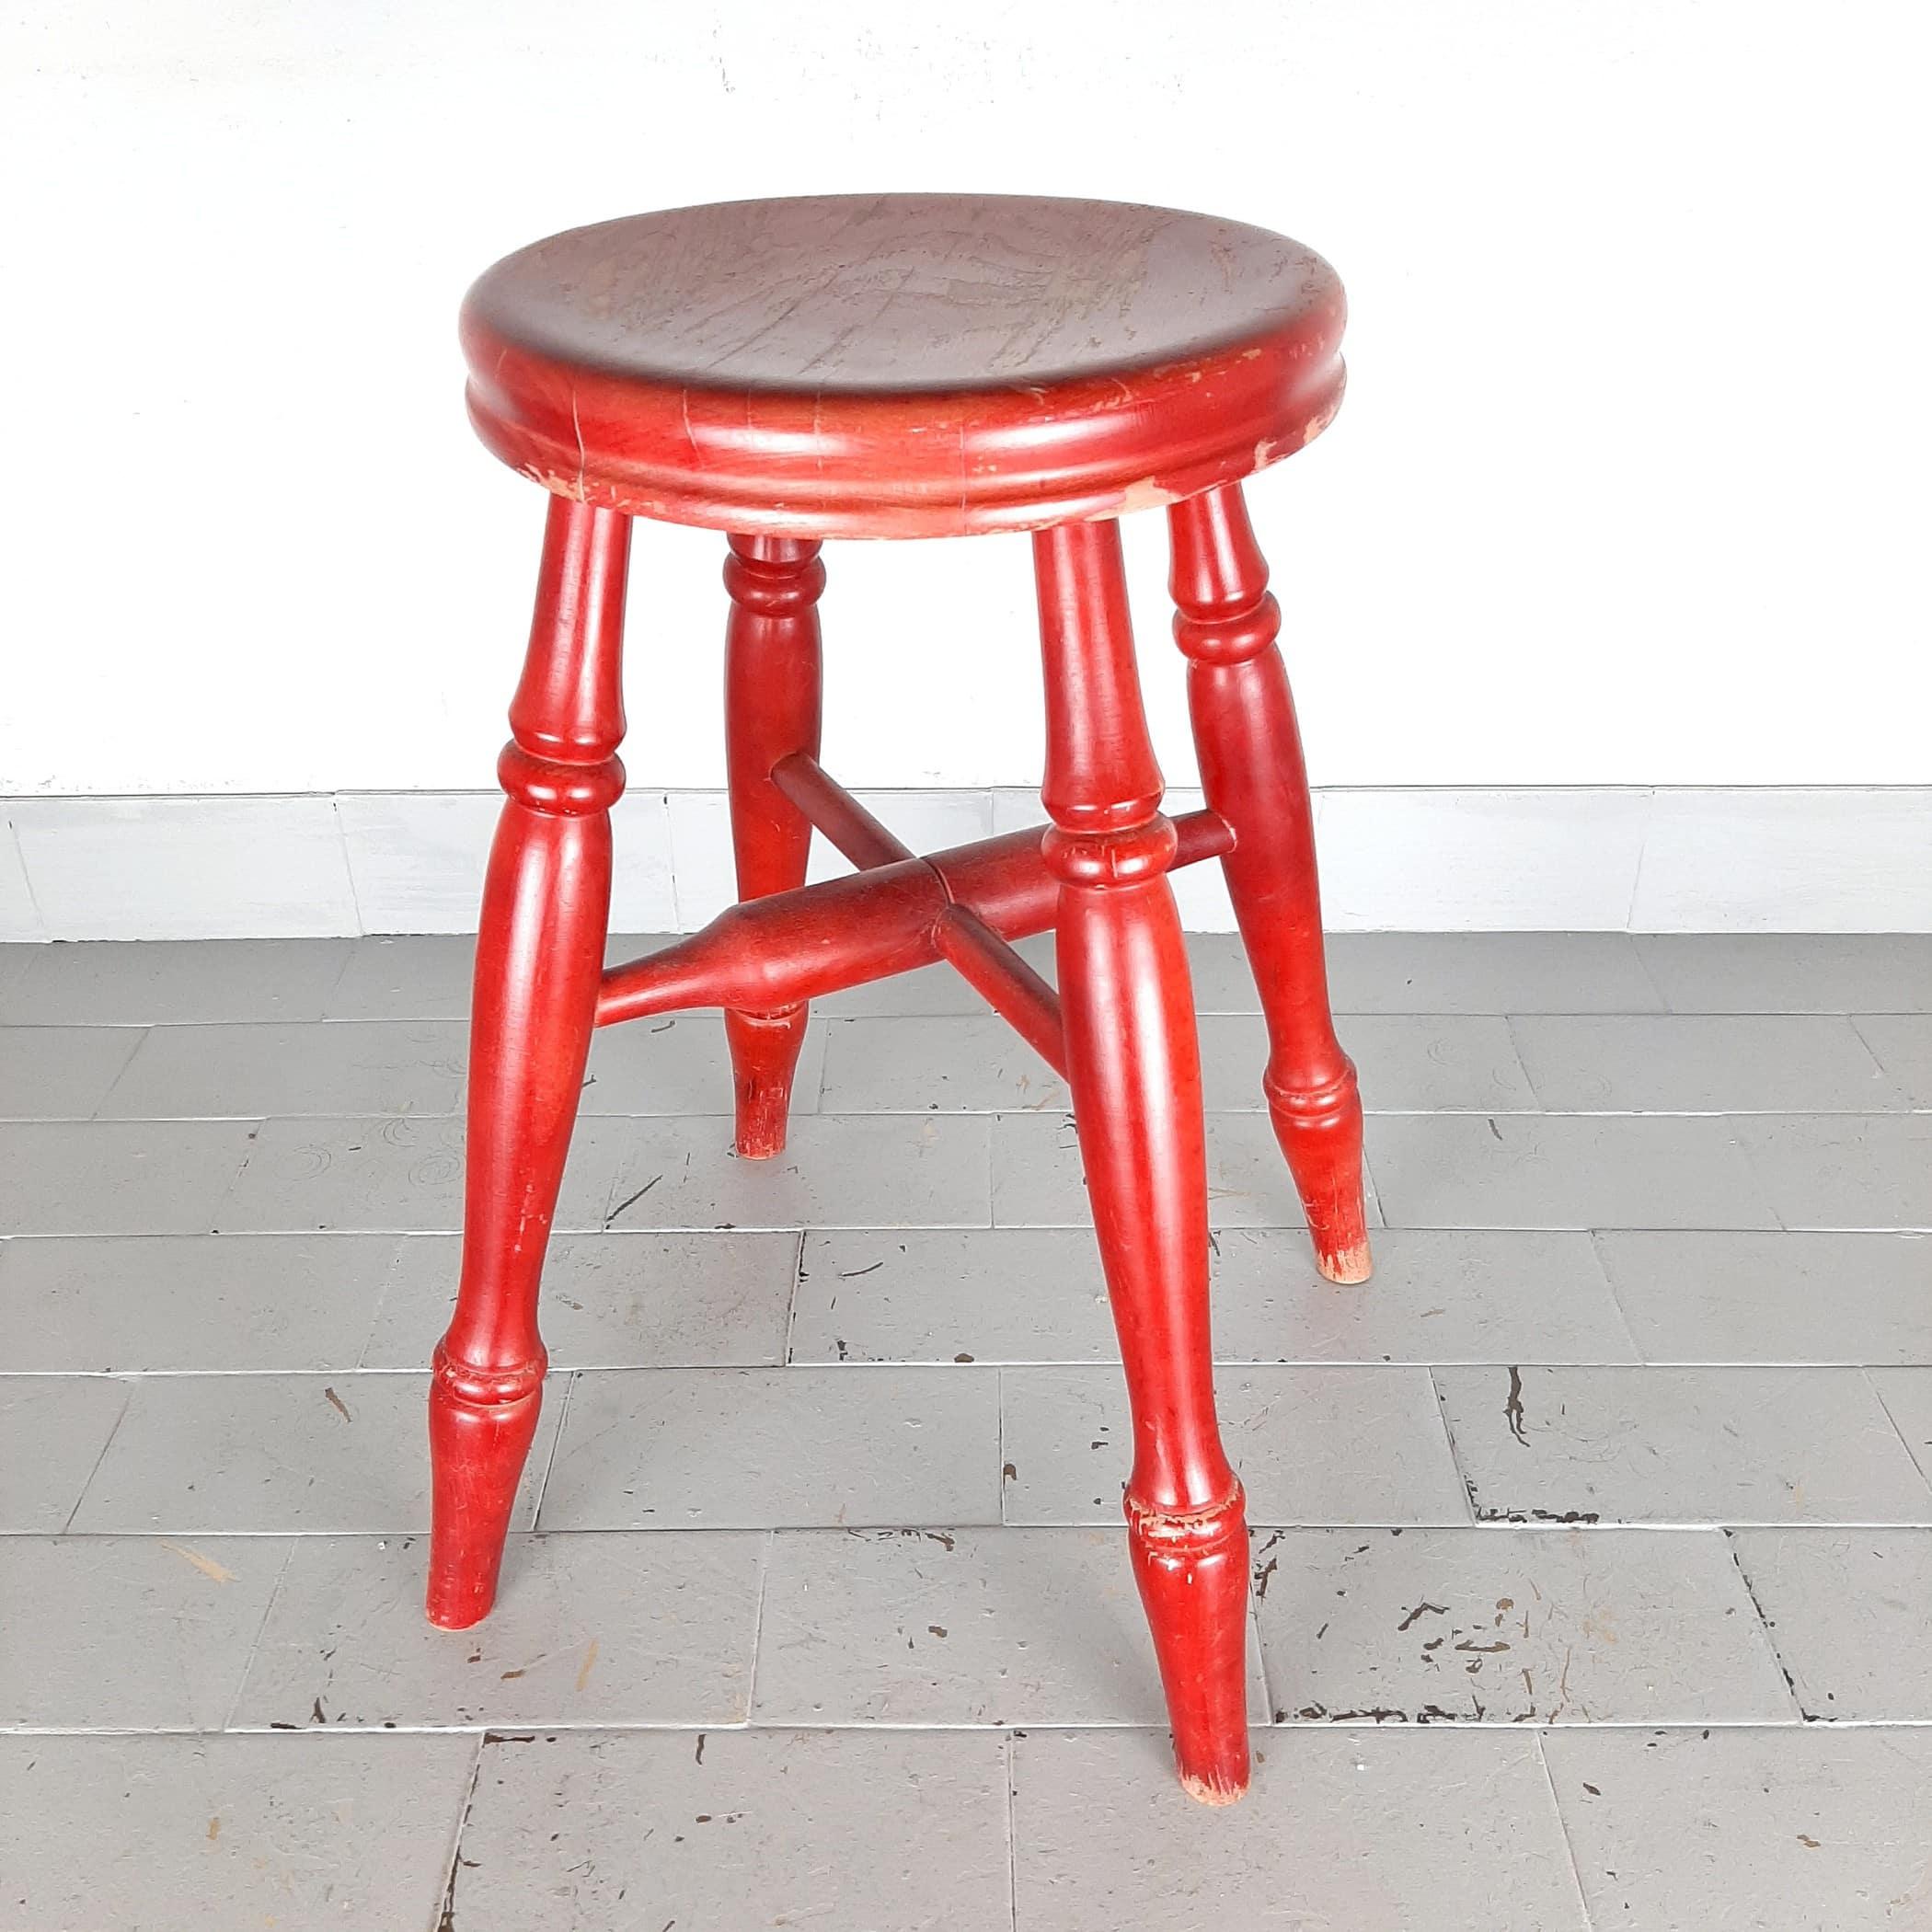 Mid-century red wood stool Yugoslavia 60s retro home decor vintage tabouret